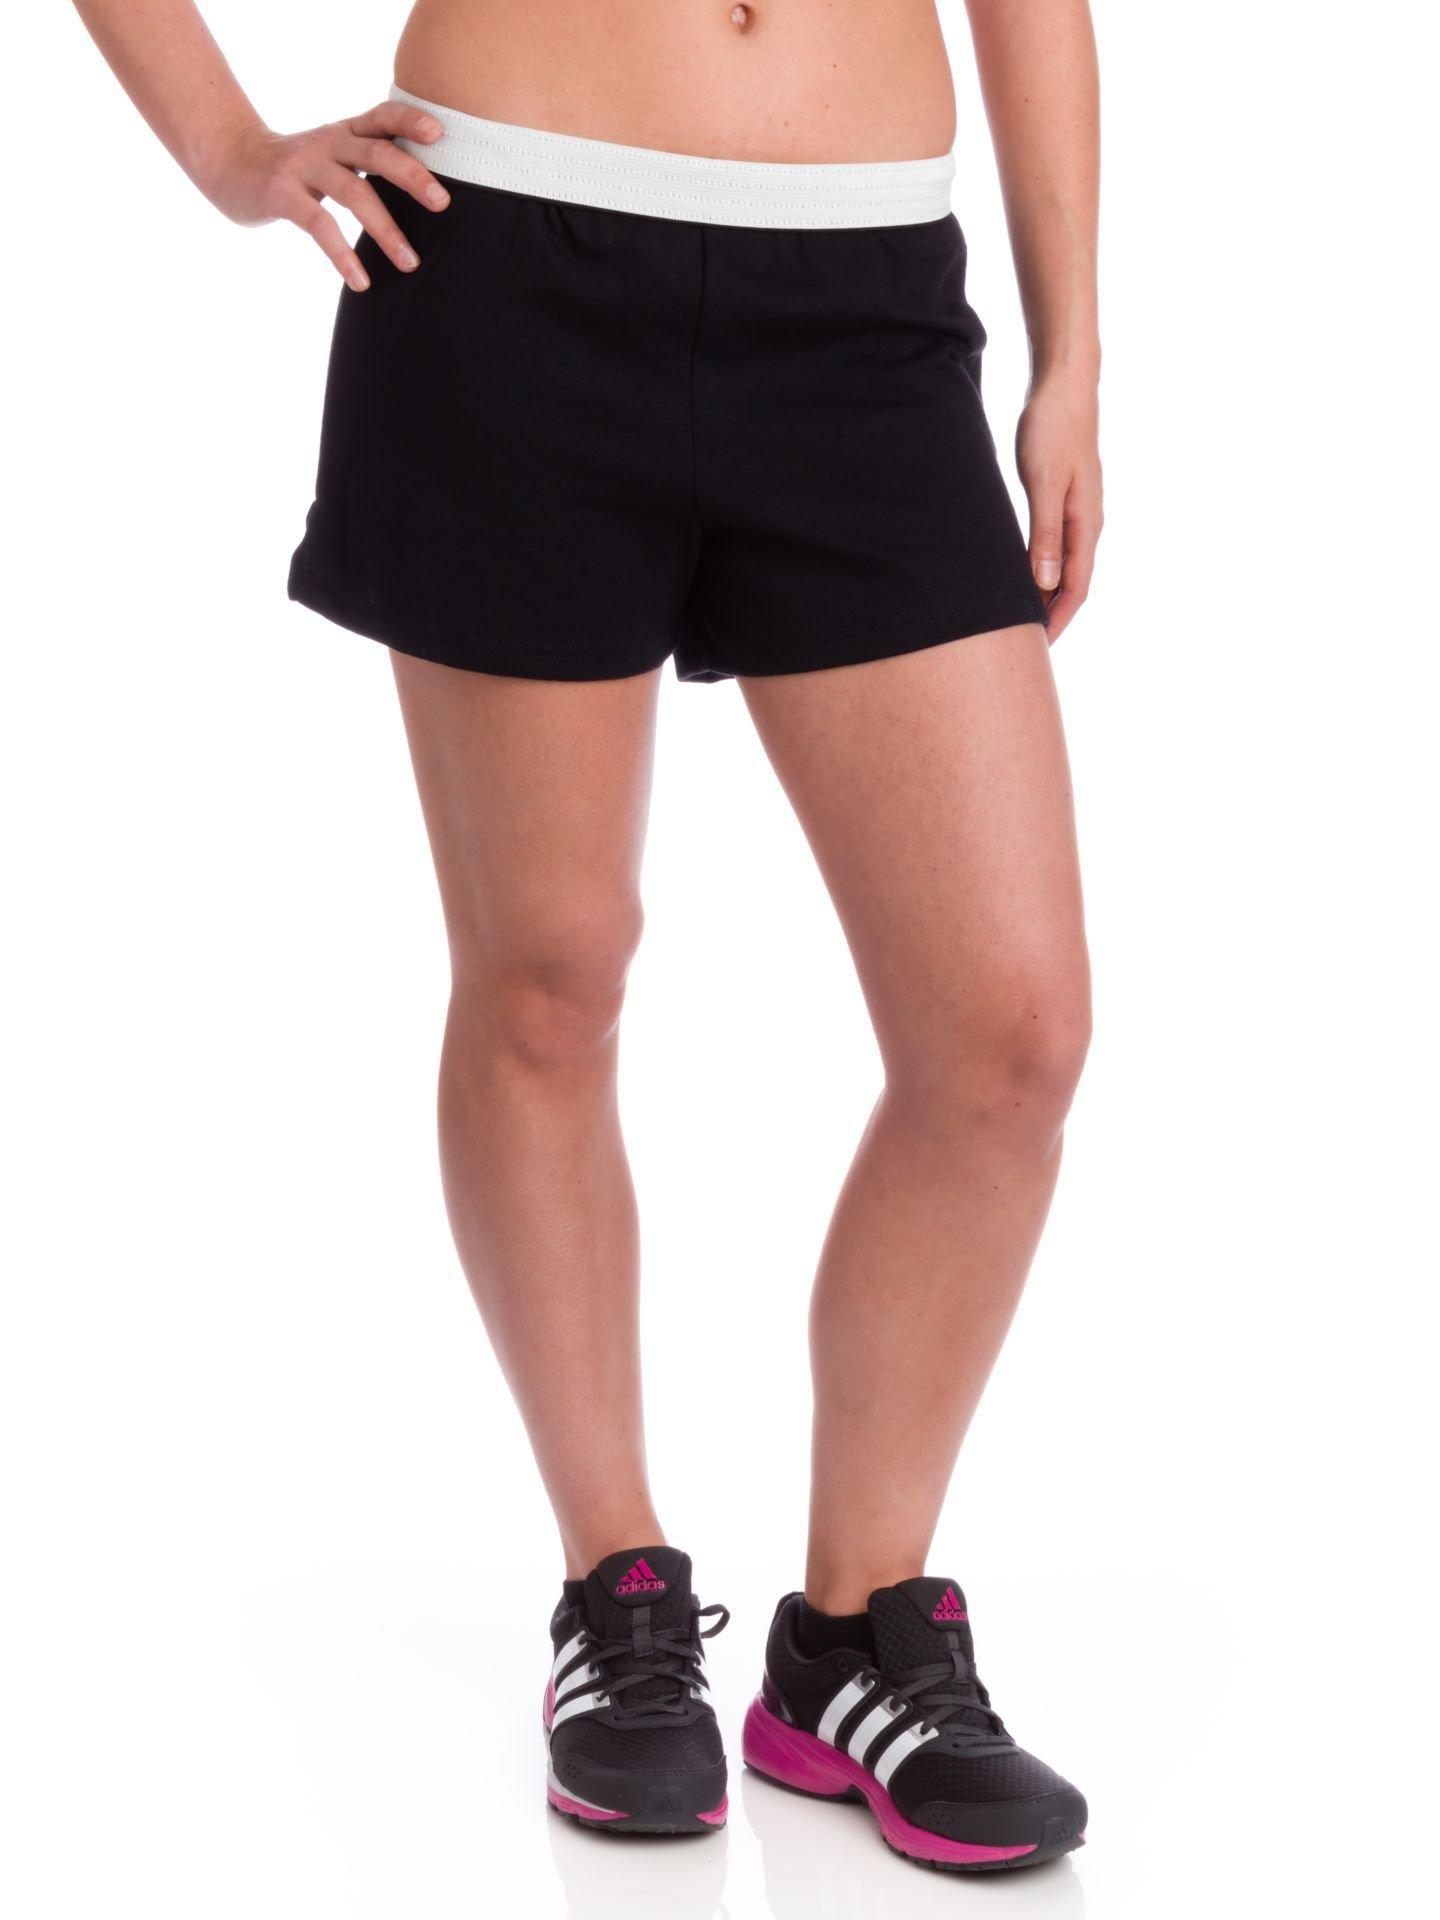 Soffe Juniors Athletic Short, Black, Large